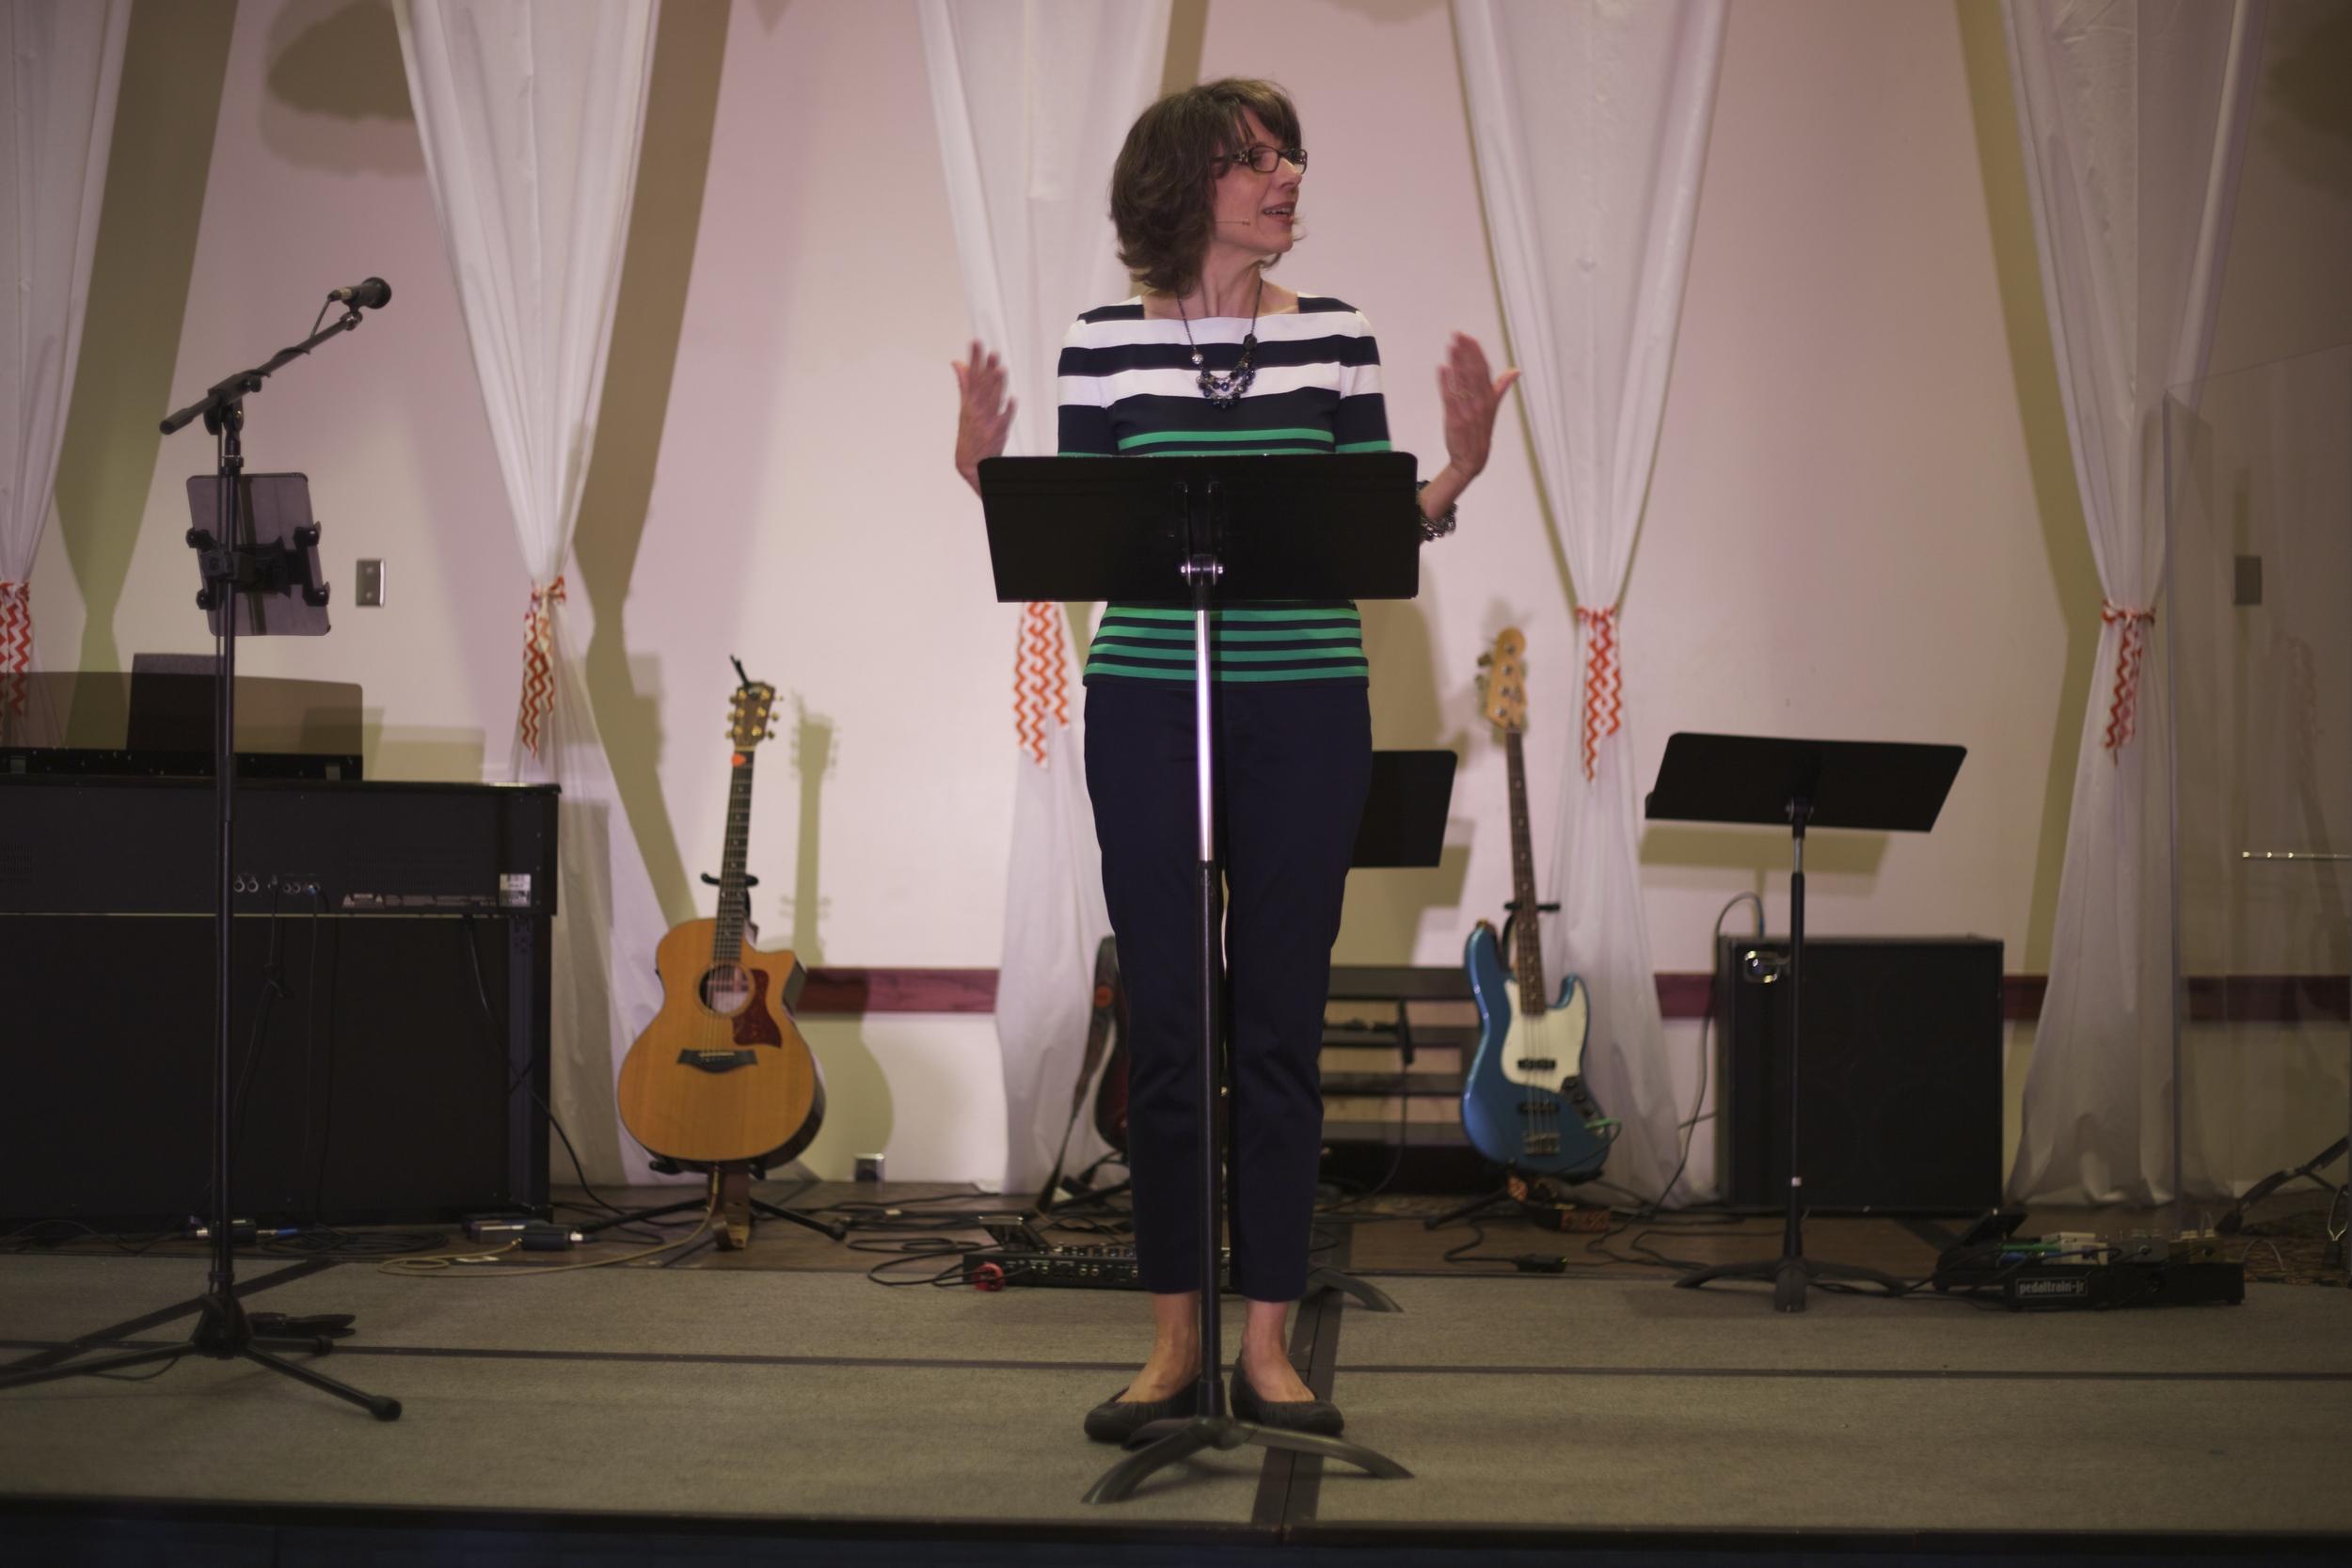 Lisa Hughes teaching at Grace Bible Church Women's Conference, Hutchinson, KS